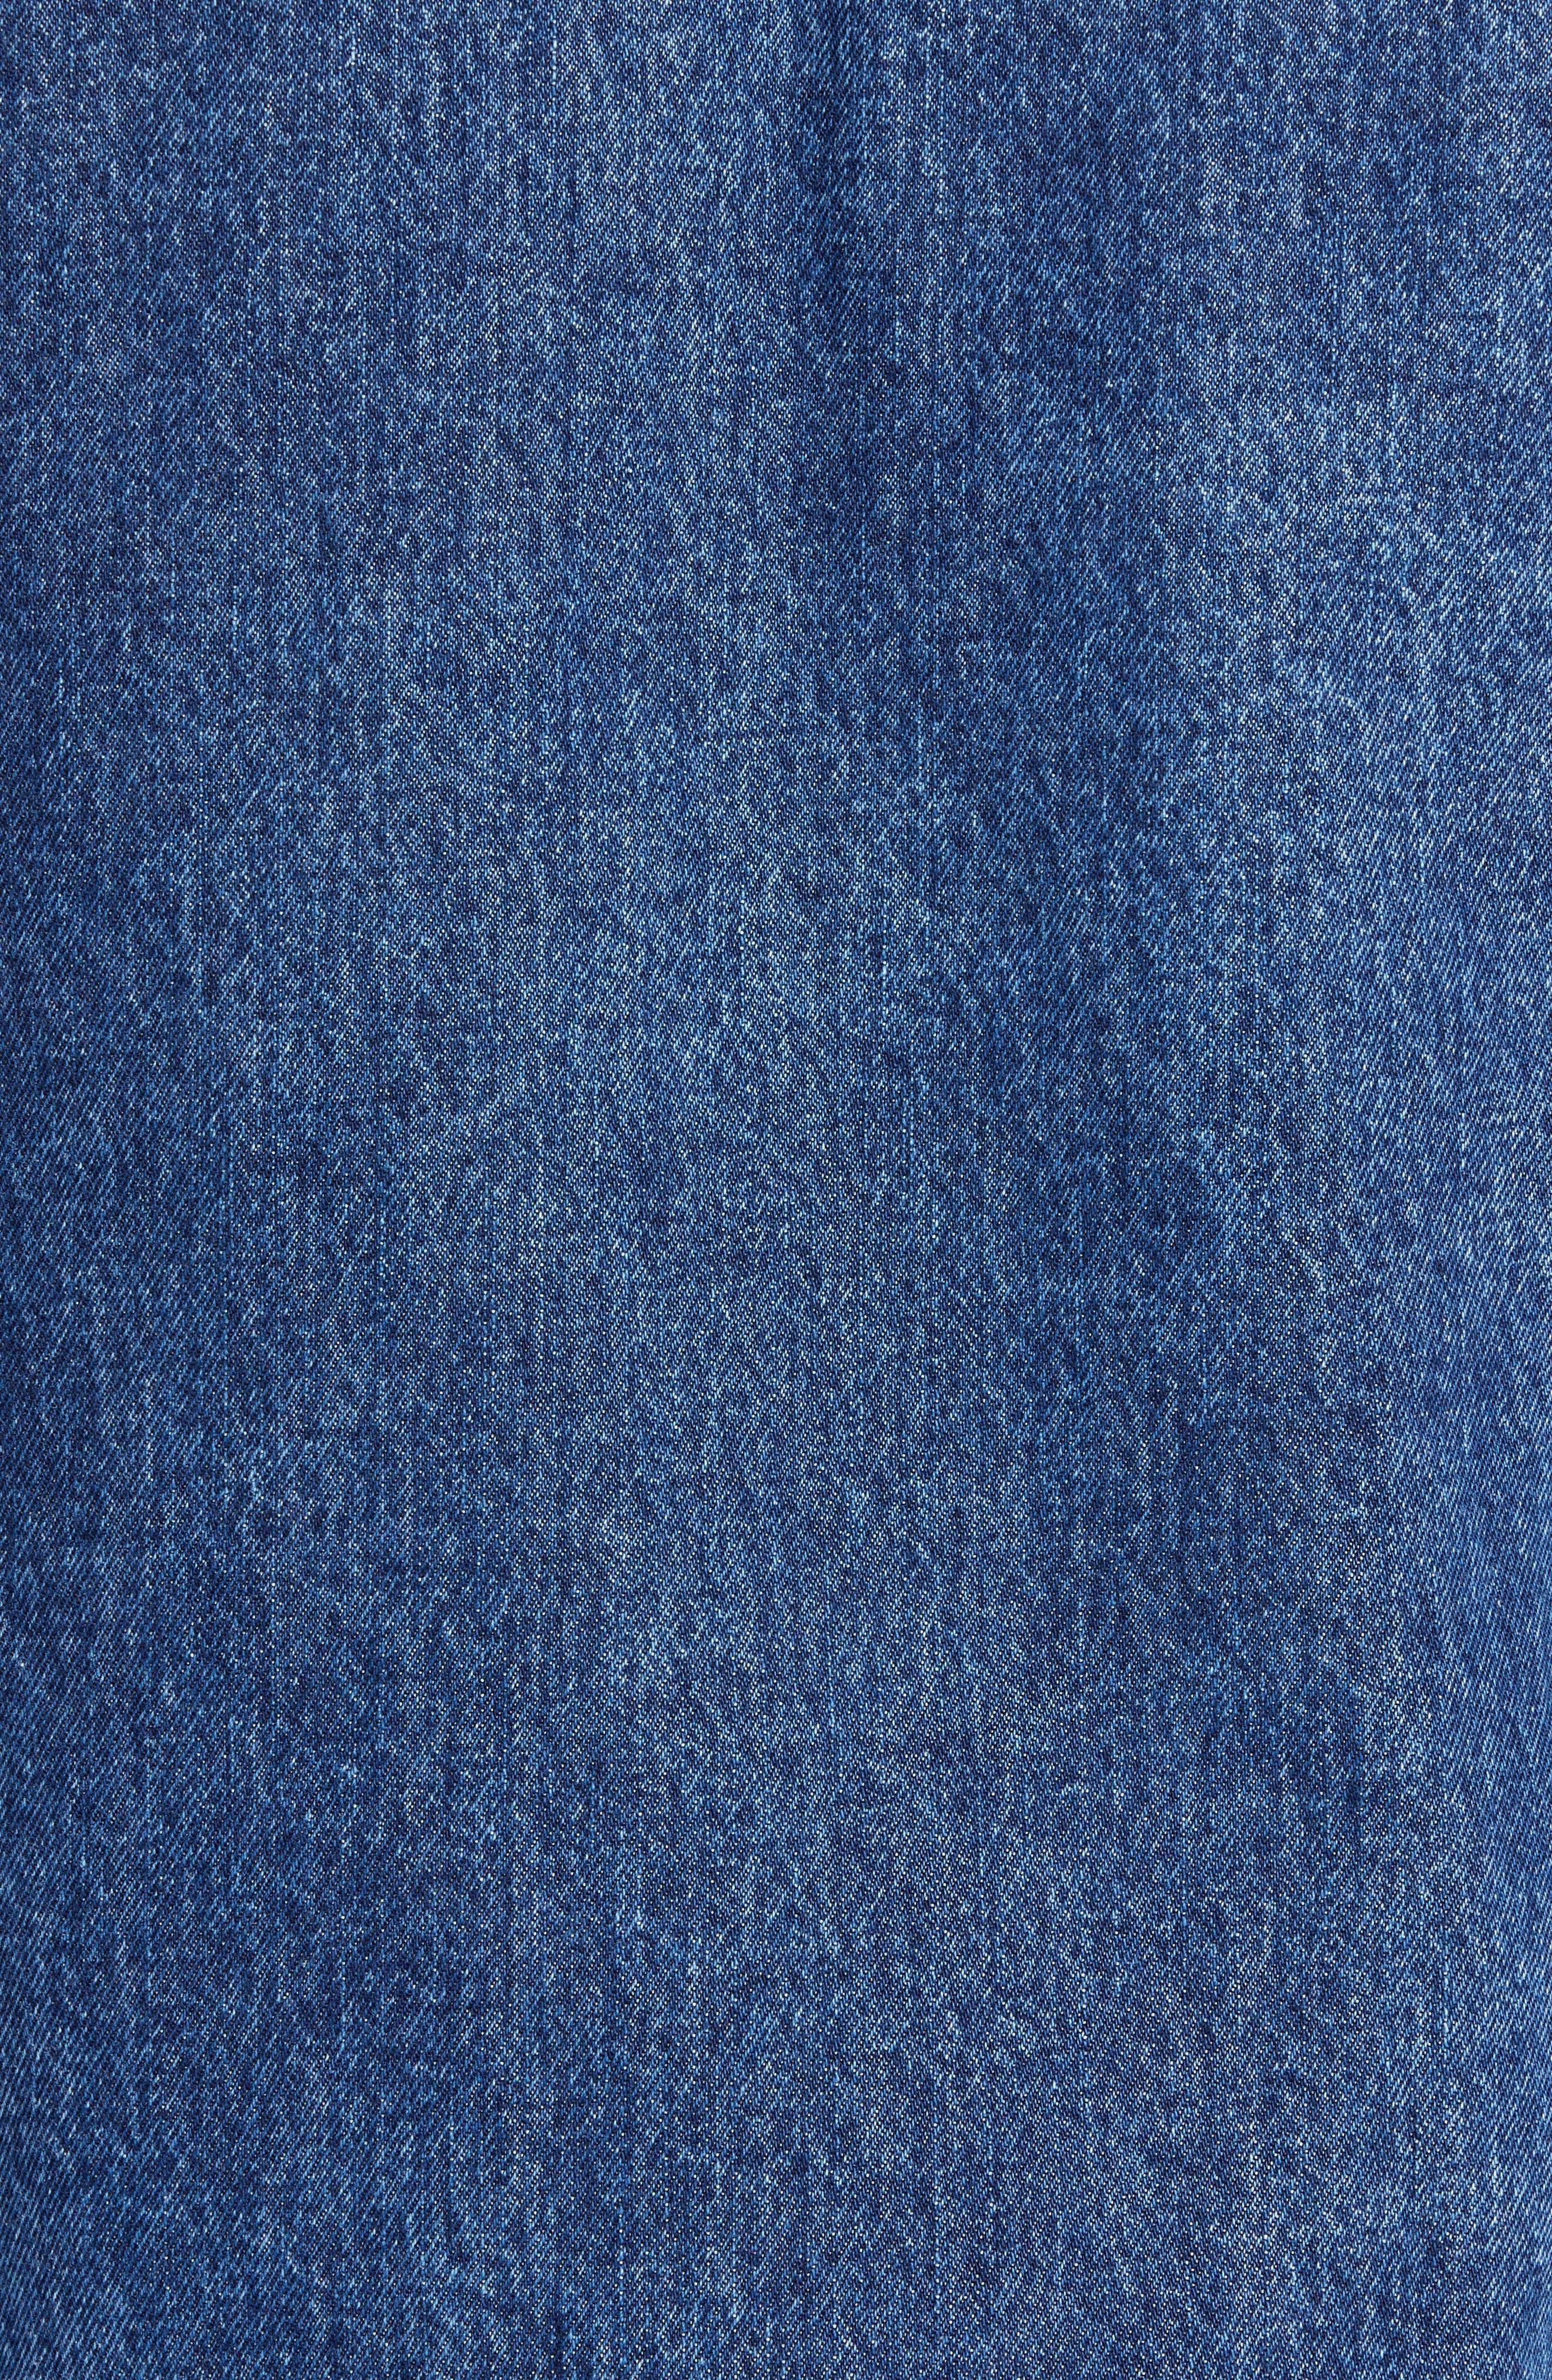 CALVIN KLEIN JEANS,                             Patch One-Pocket Denim Jacket,                             Alternate thumbnail 7, color,                             400